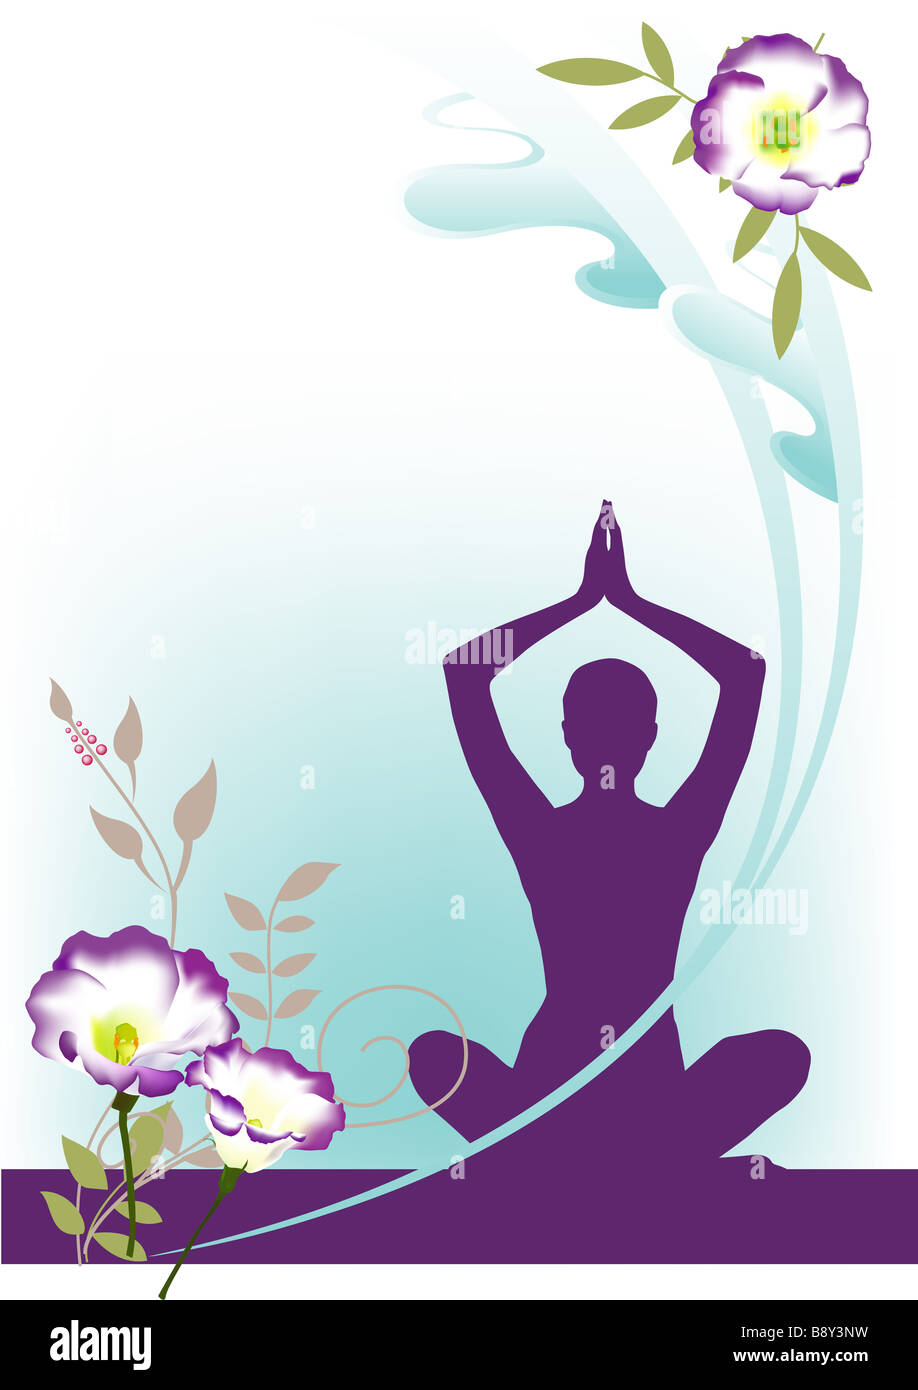 Yoga Woman Silhouette Lotus Flower Stock Photos Yoga Woman